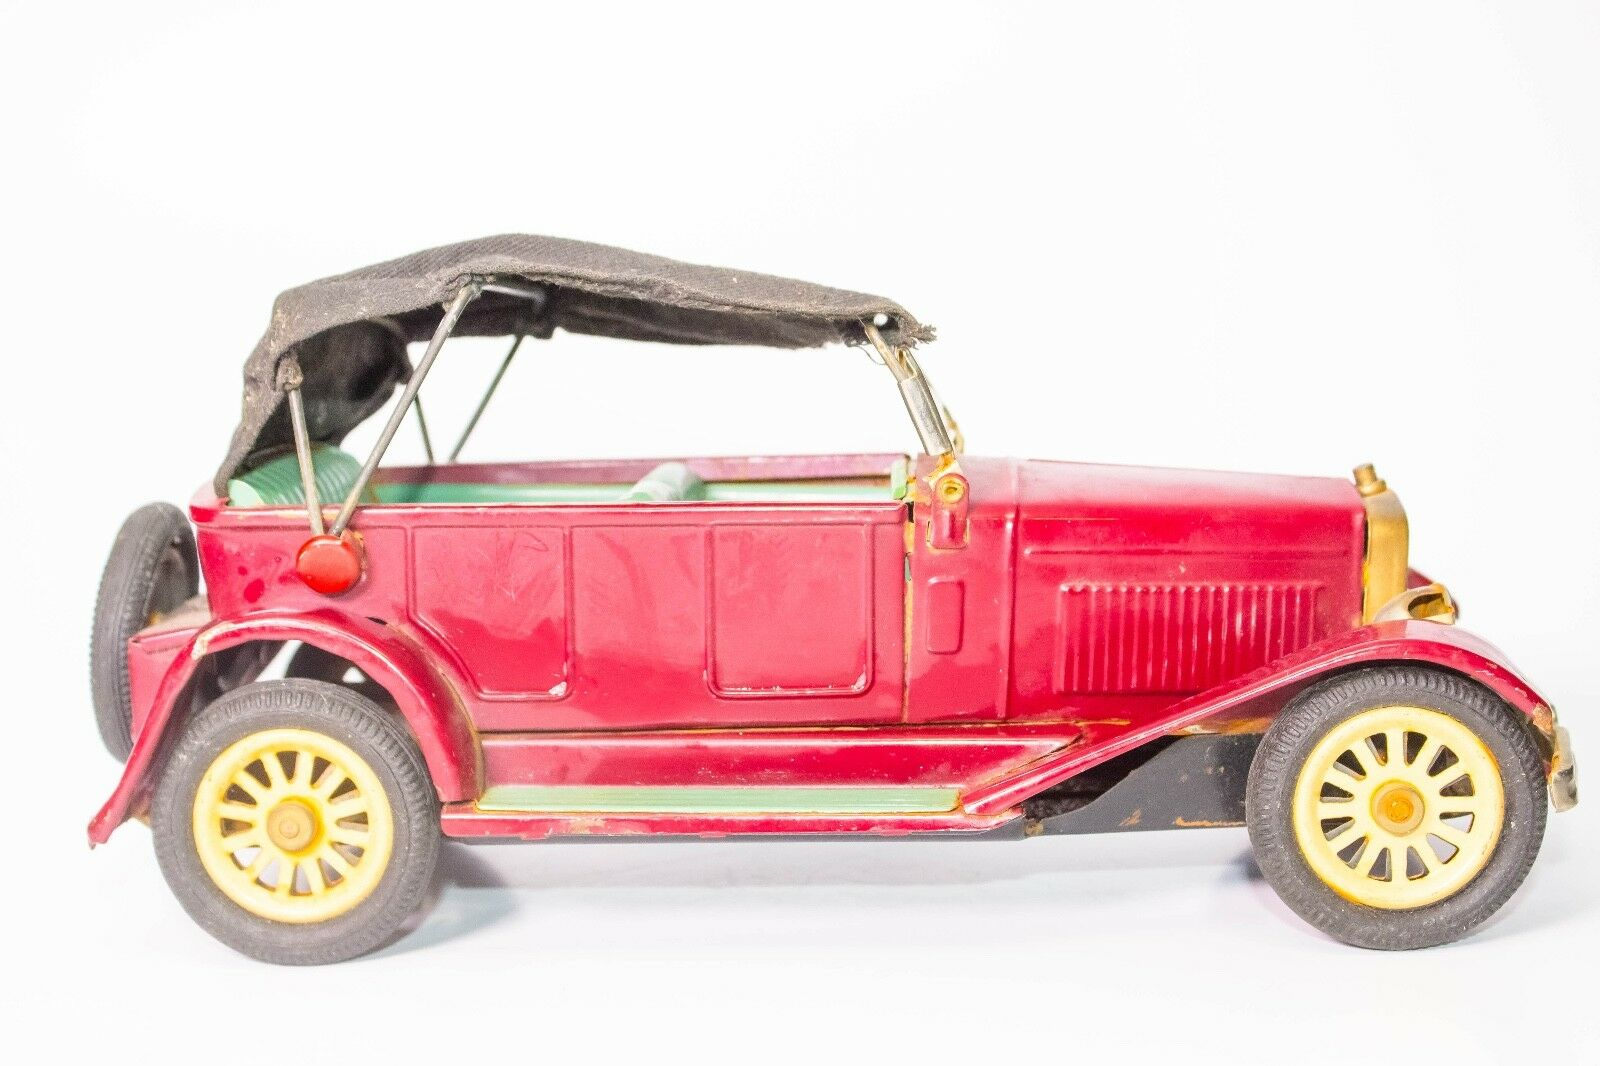 Vintage Japanisch Blech Reibung Sss Shioji 1925 Nash Phaeton Touring Limo